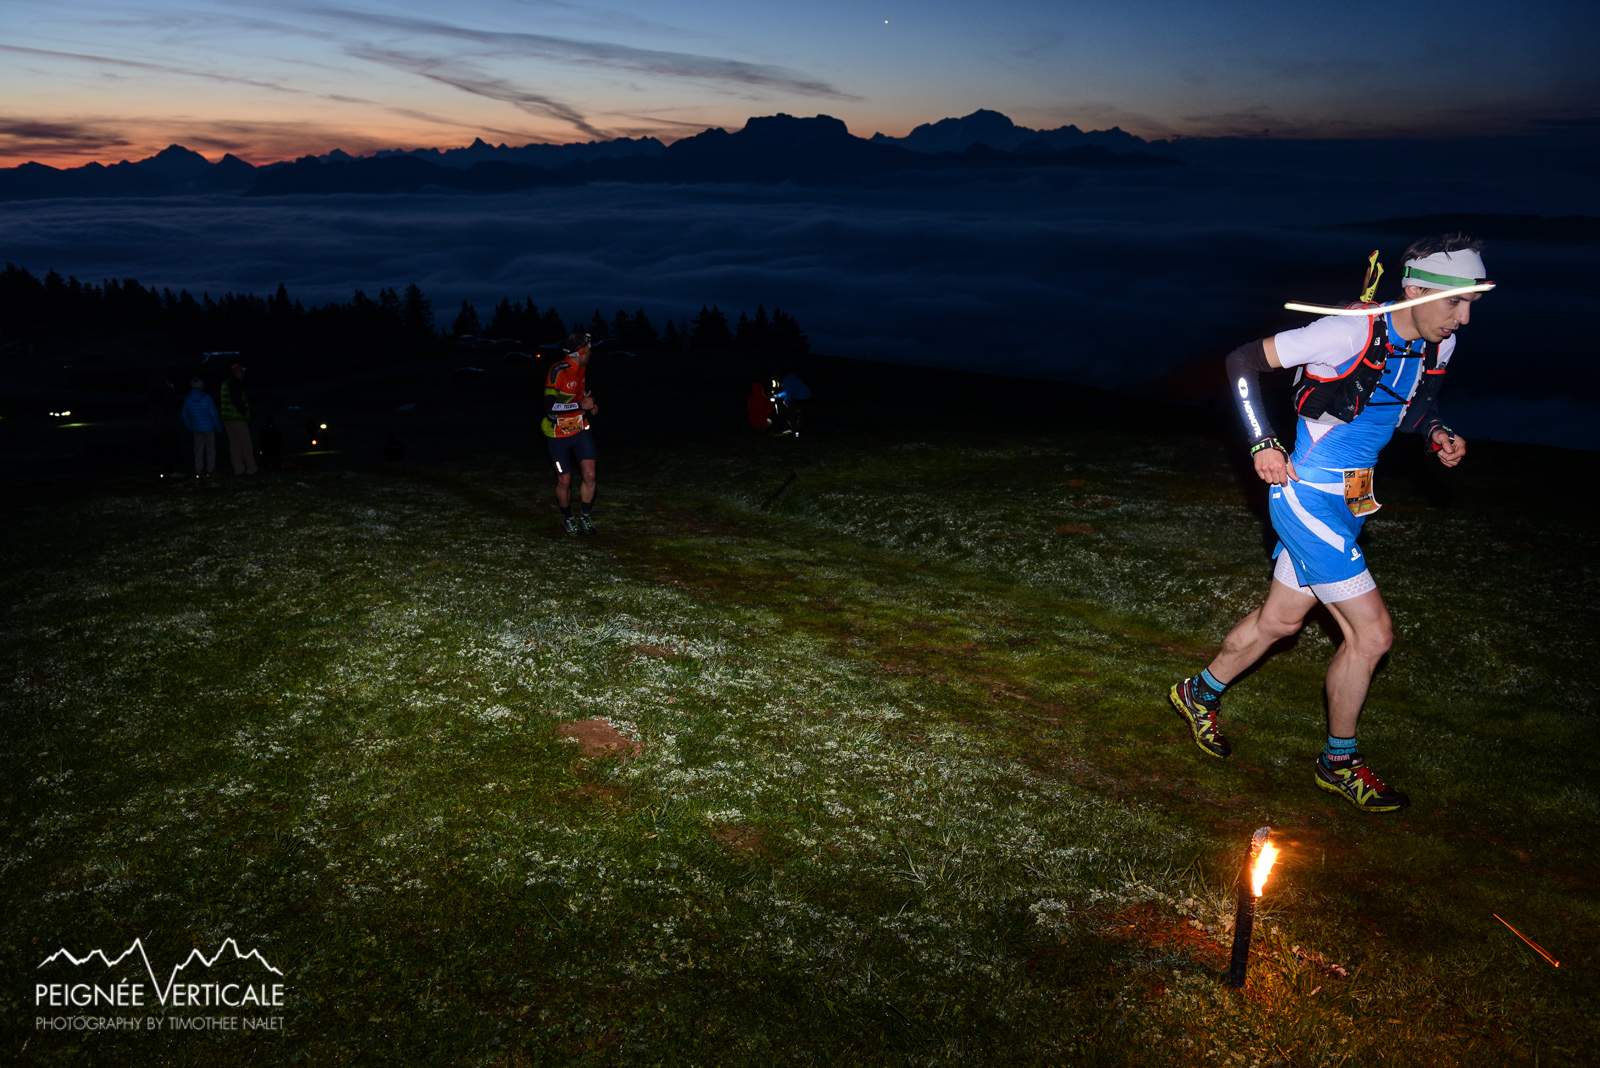 MaxiRace-Annecy-2014-Team-Hoka-Timothee-Nalet-0705.jpg